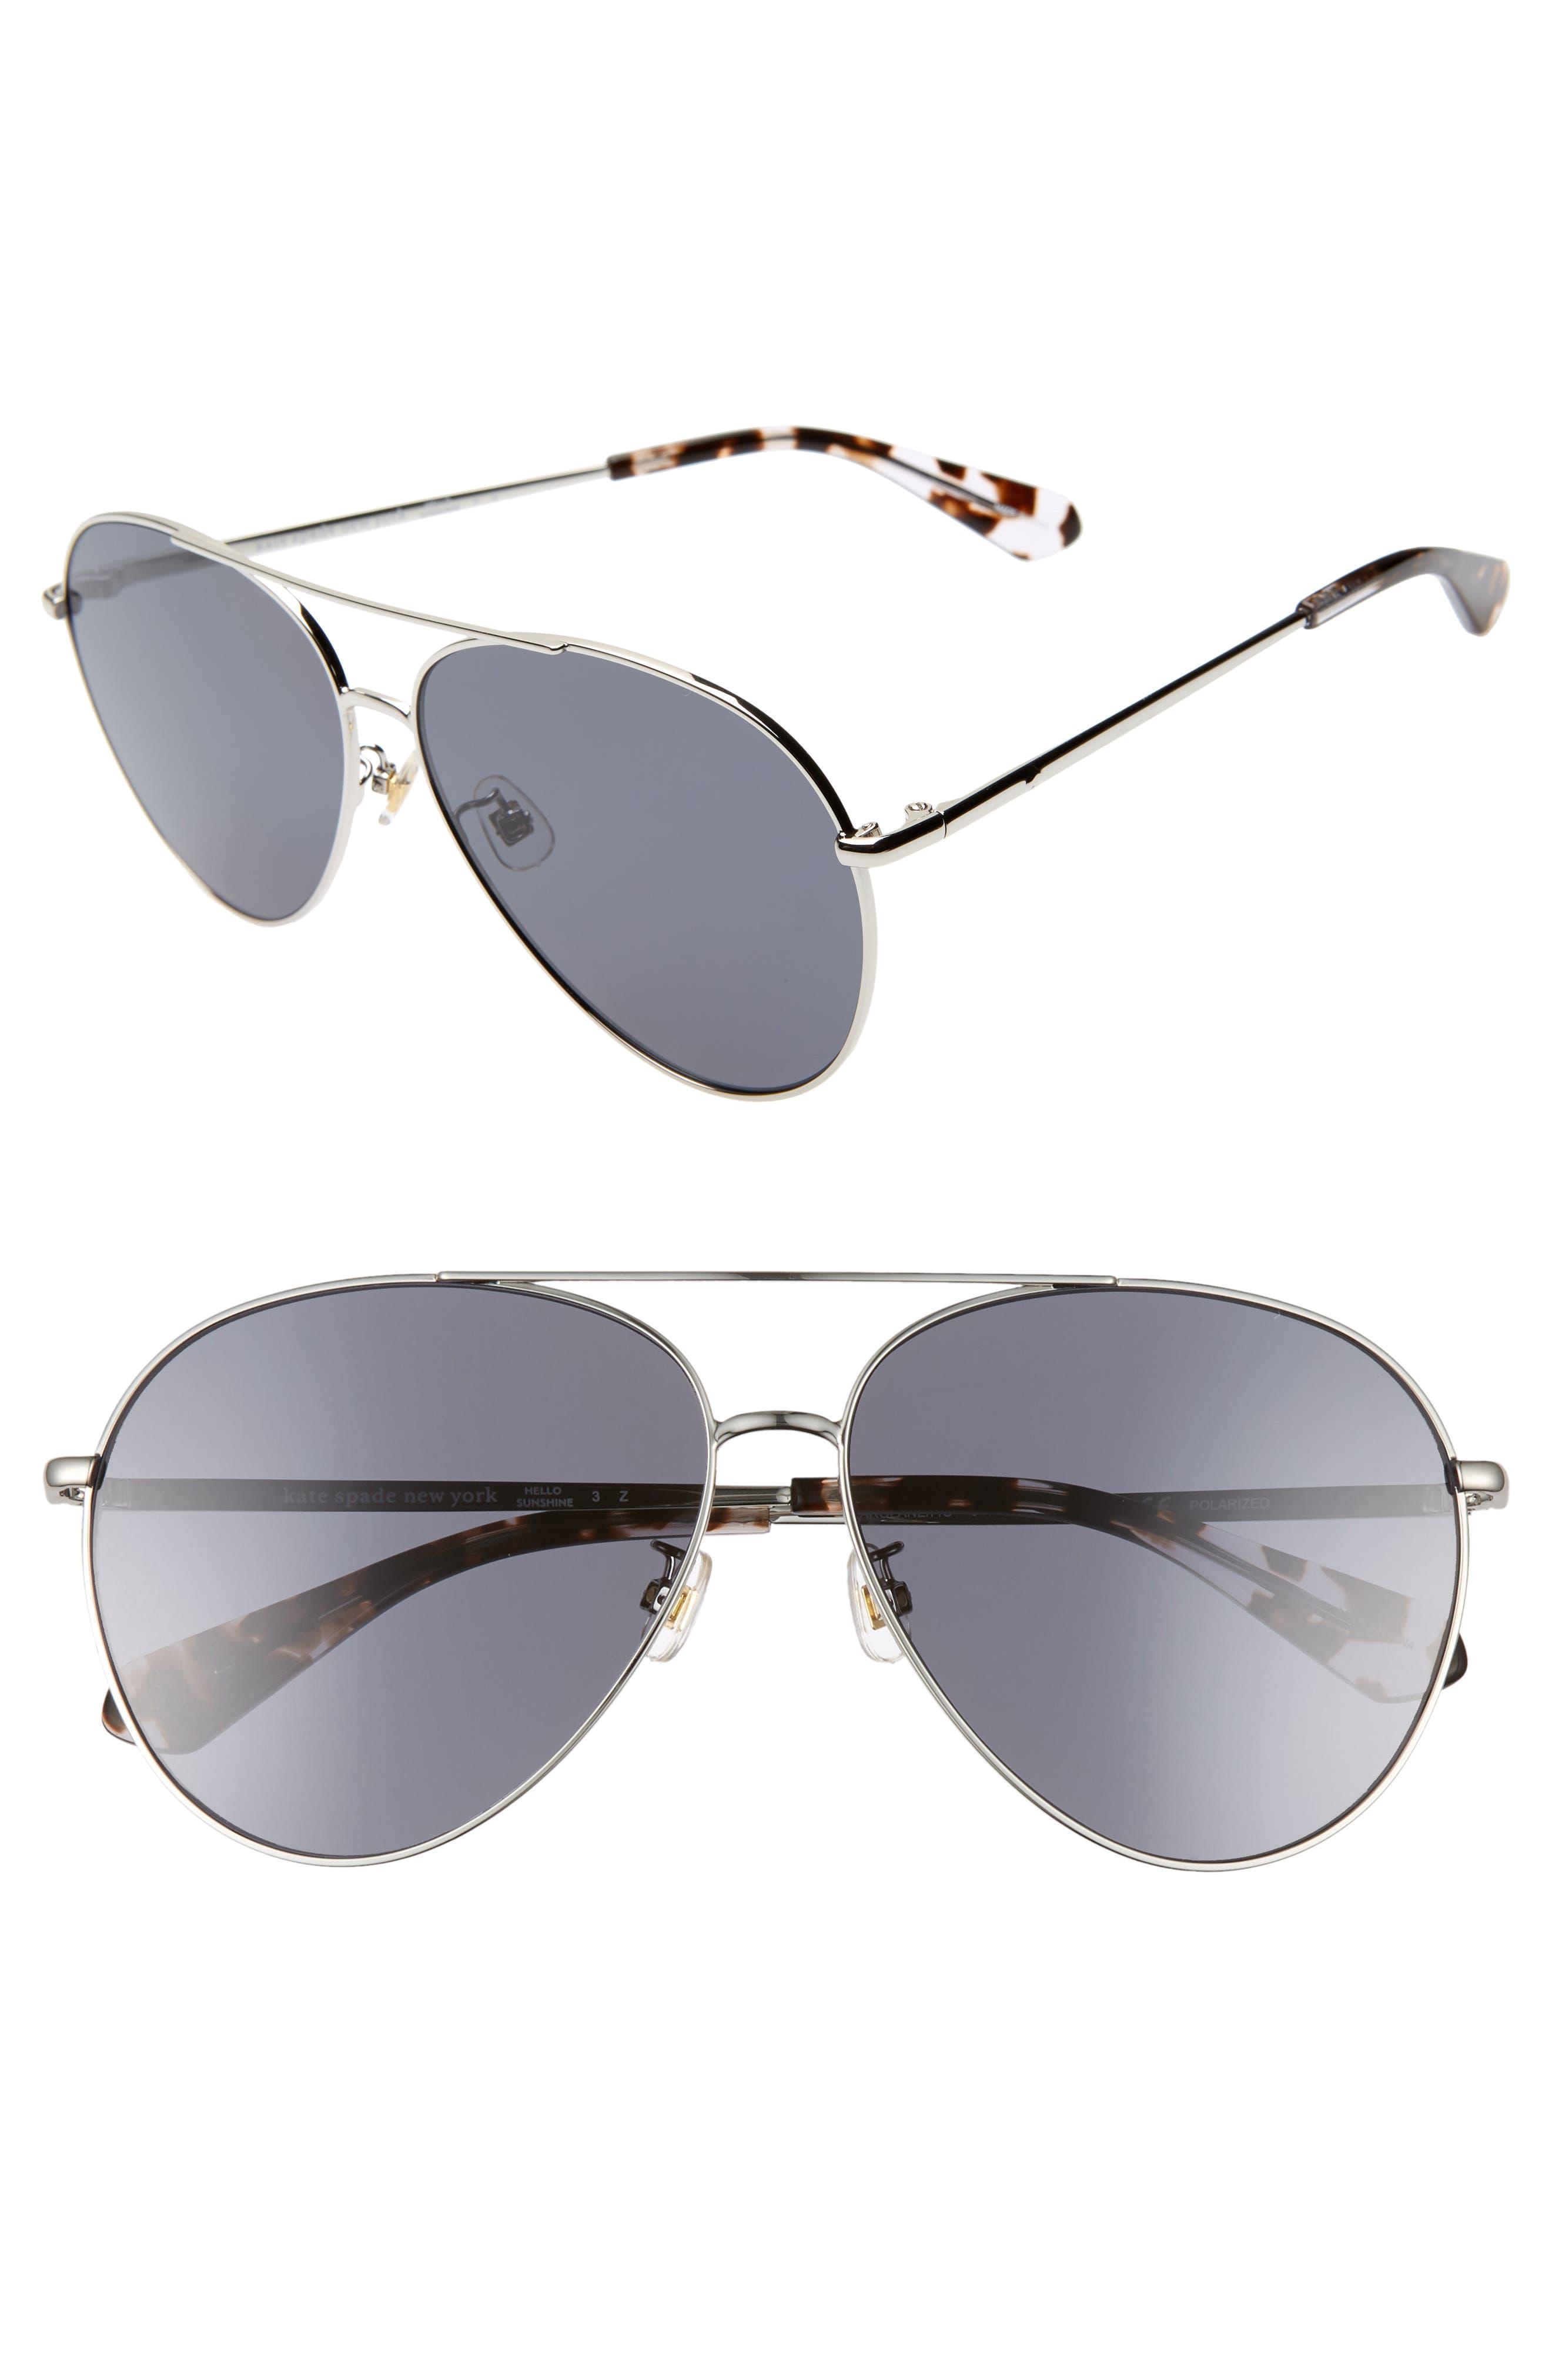 Image of kate spade new york carolane 61mm special fit polarized aviator sunglasses